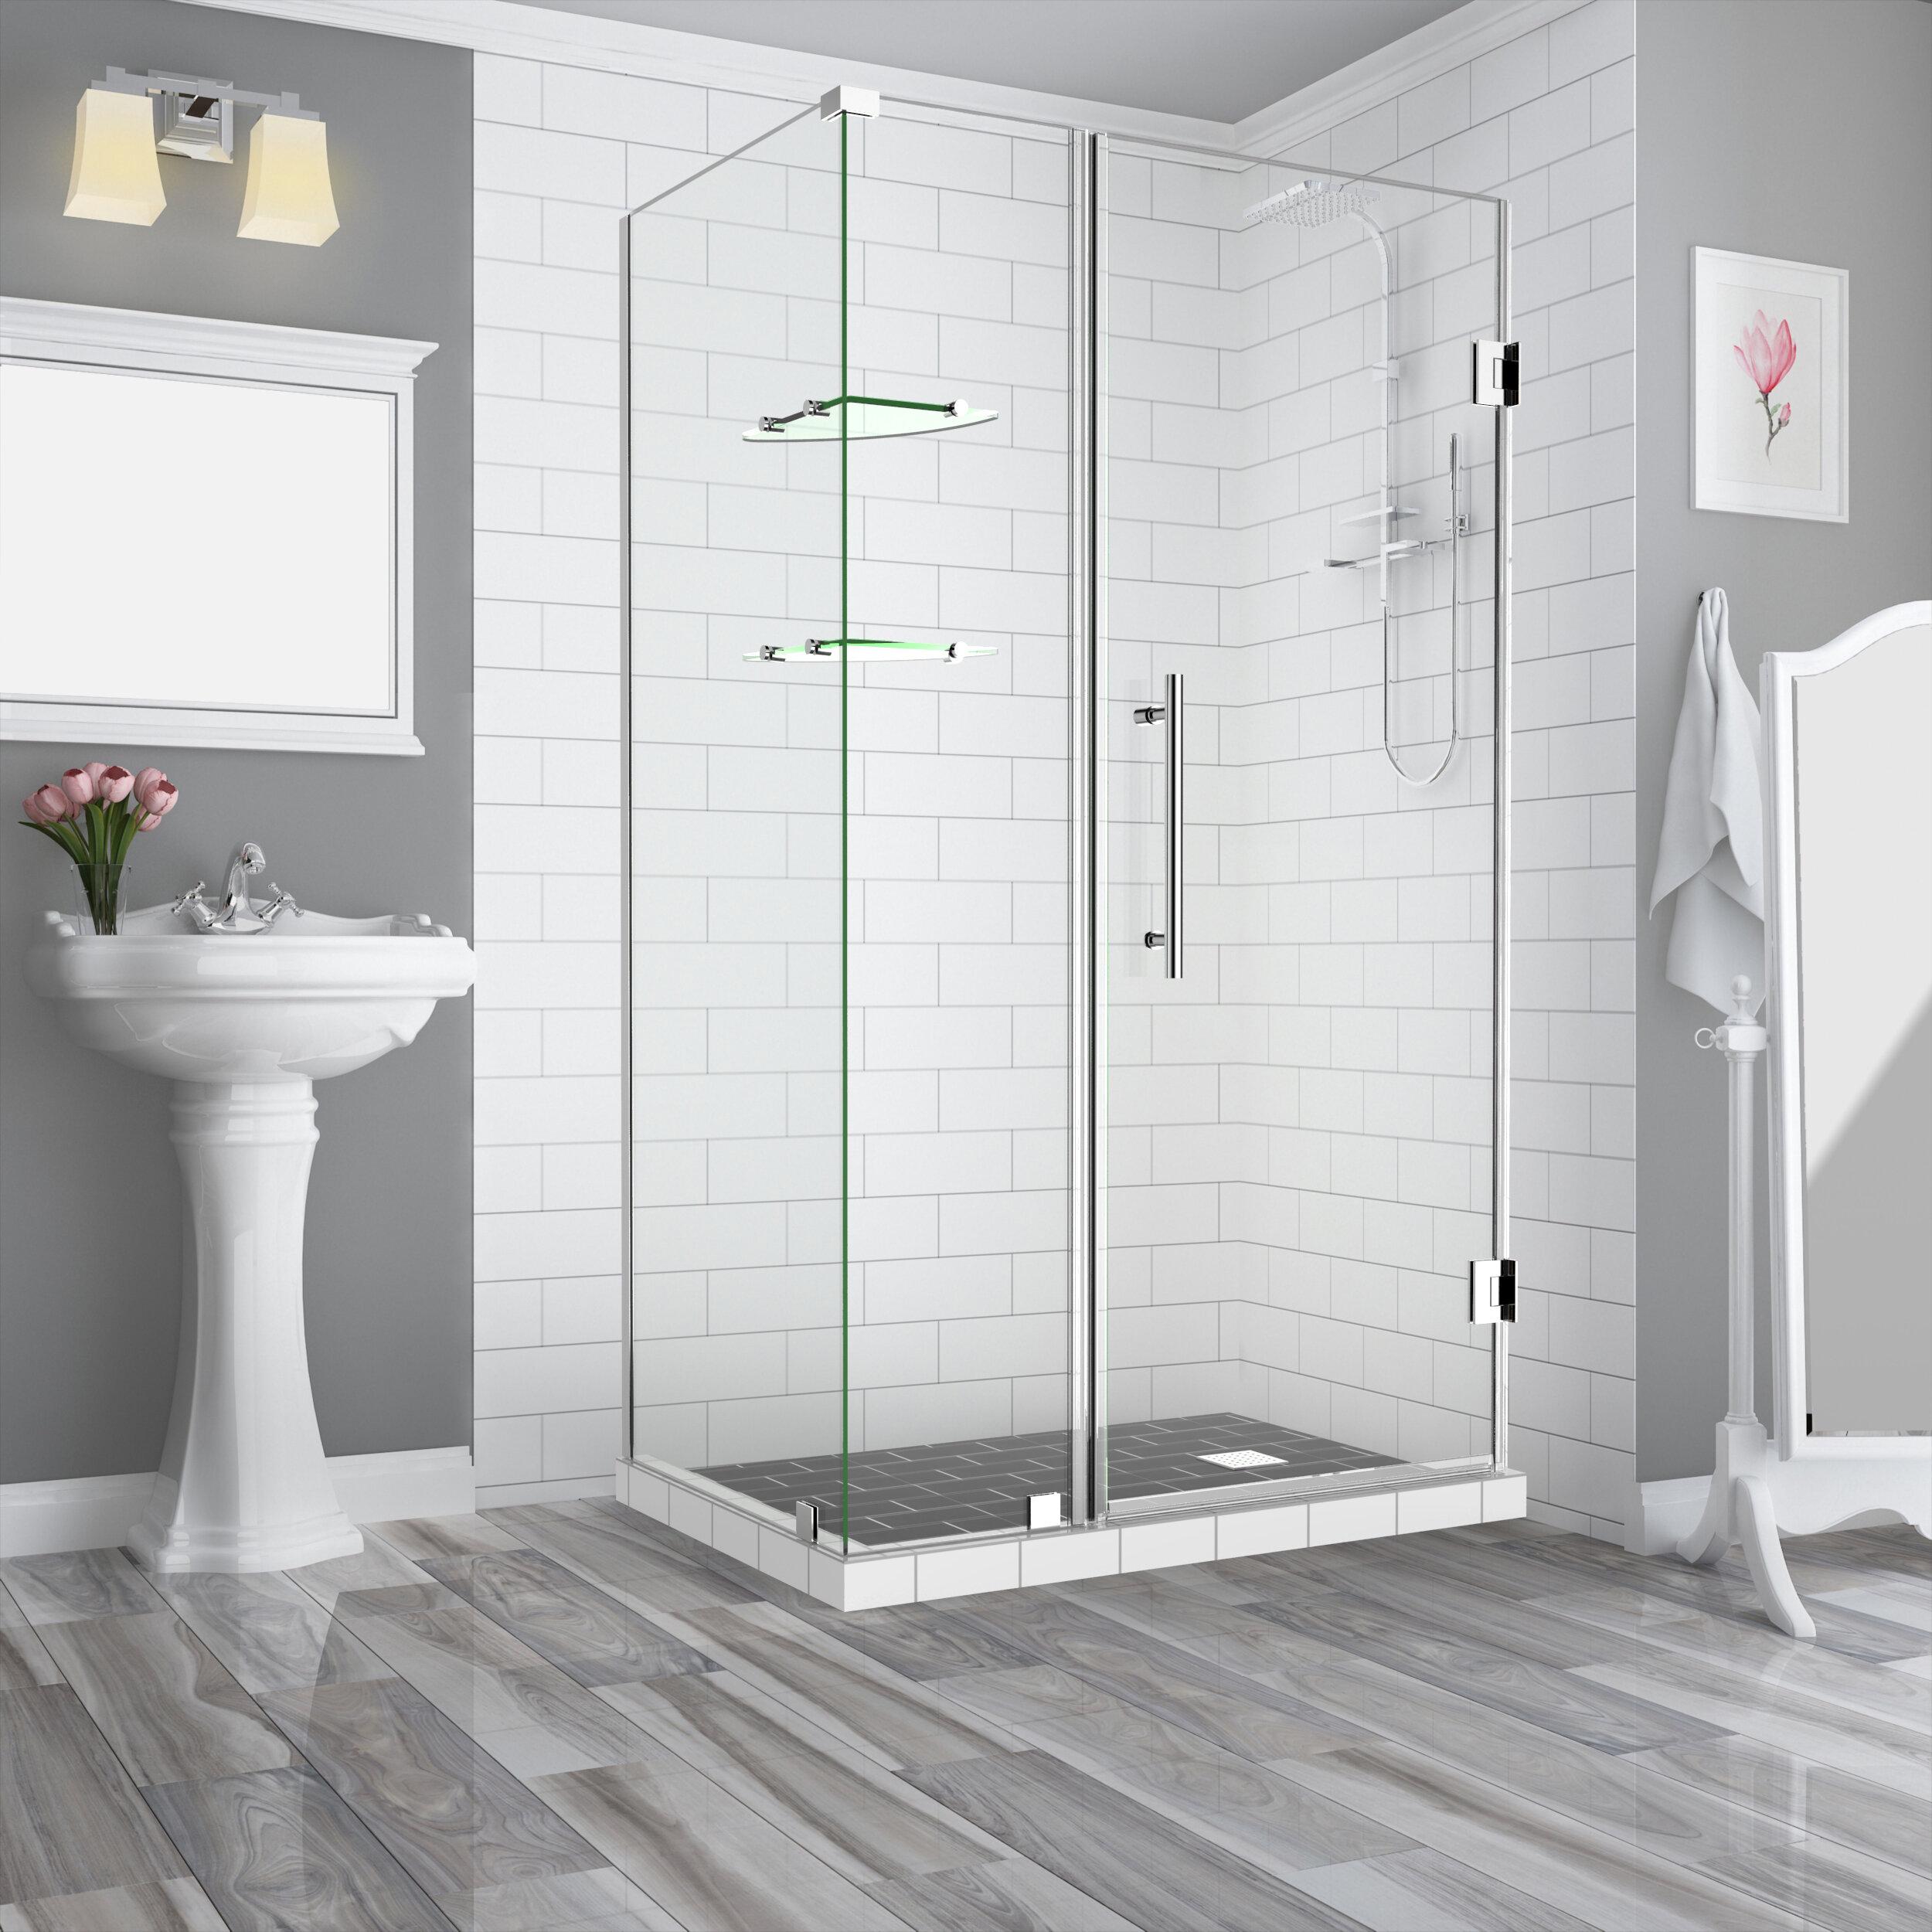 Aston Bromley Gs 68 X 72 Rectangle Hinged Shower Enclosure Wayfair